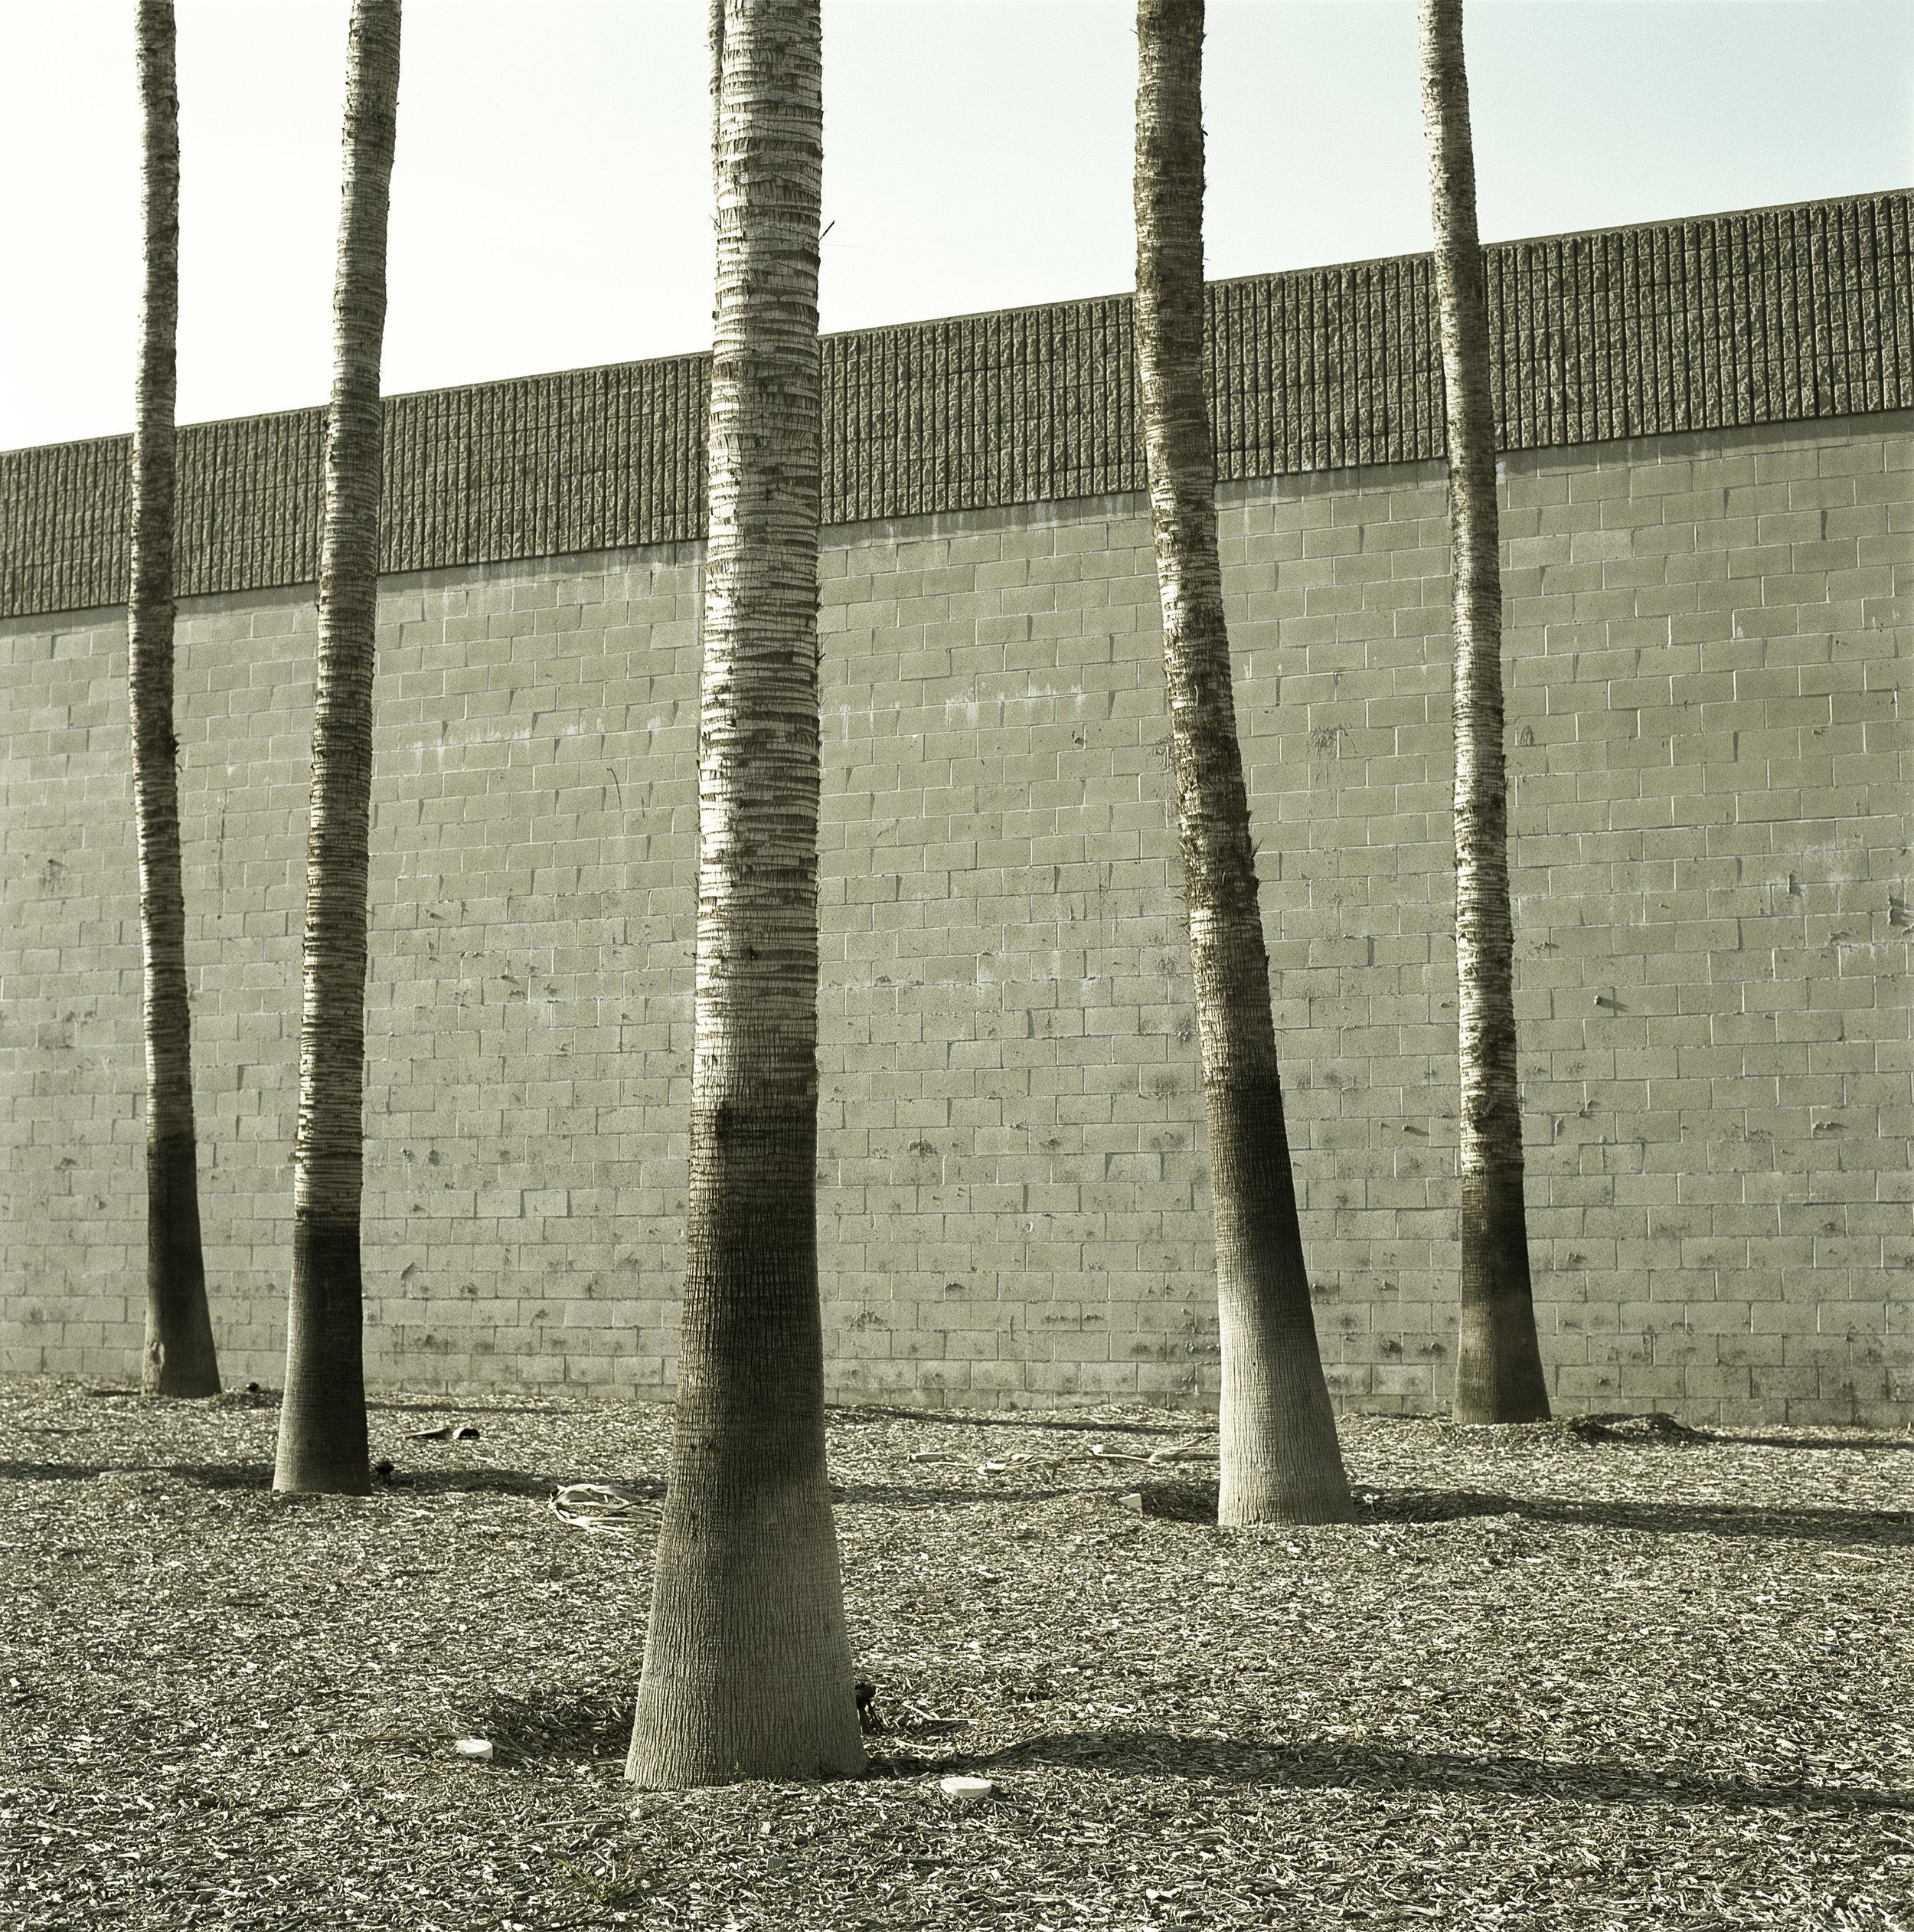 5 trunks-long beach1.jpg